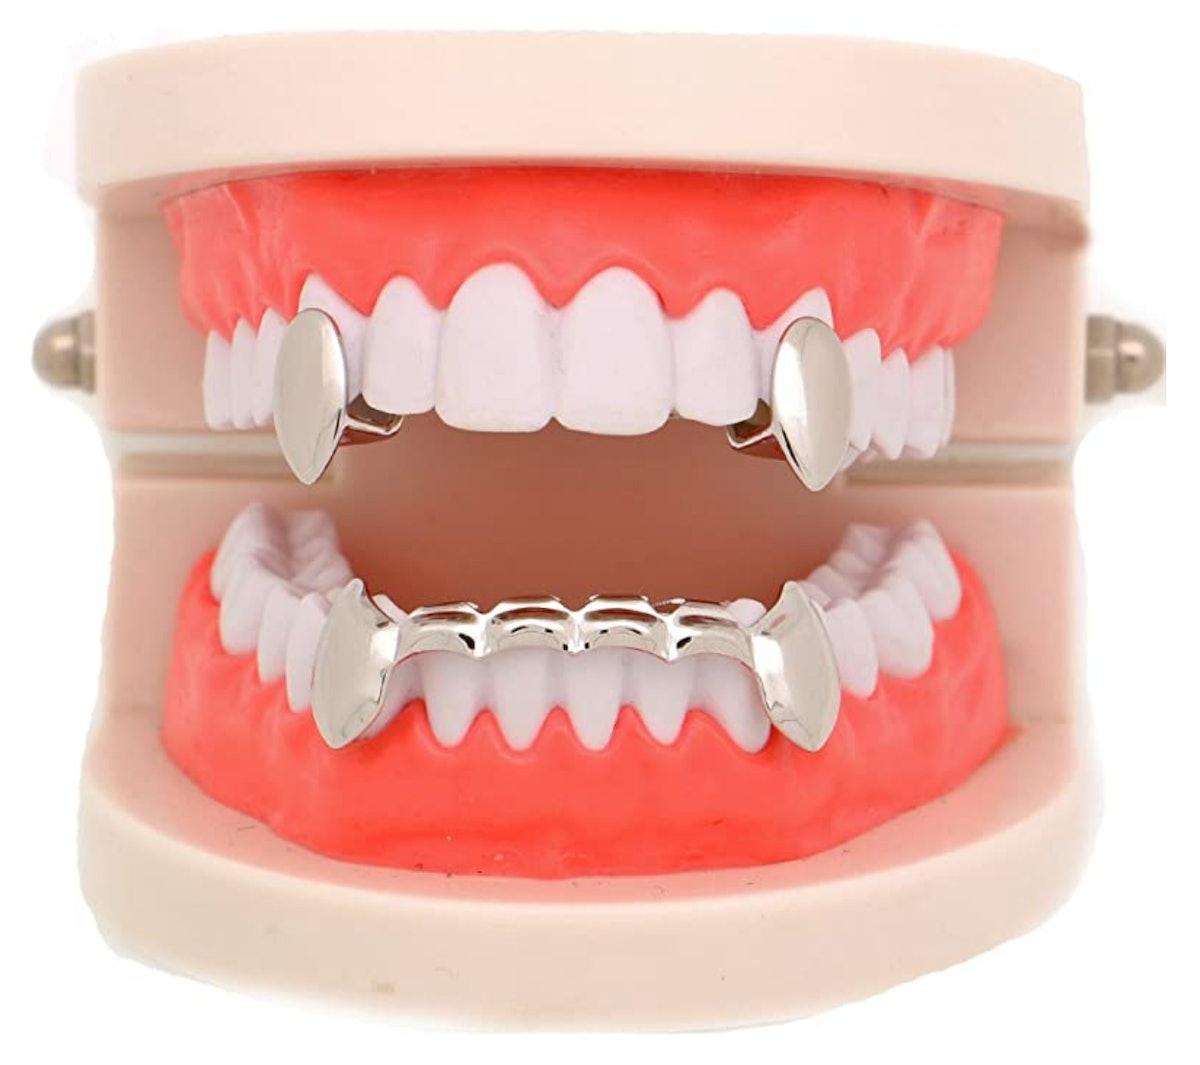 LuReen 14k Gold Vampire Dracula Teeth Grillz